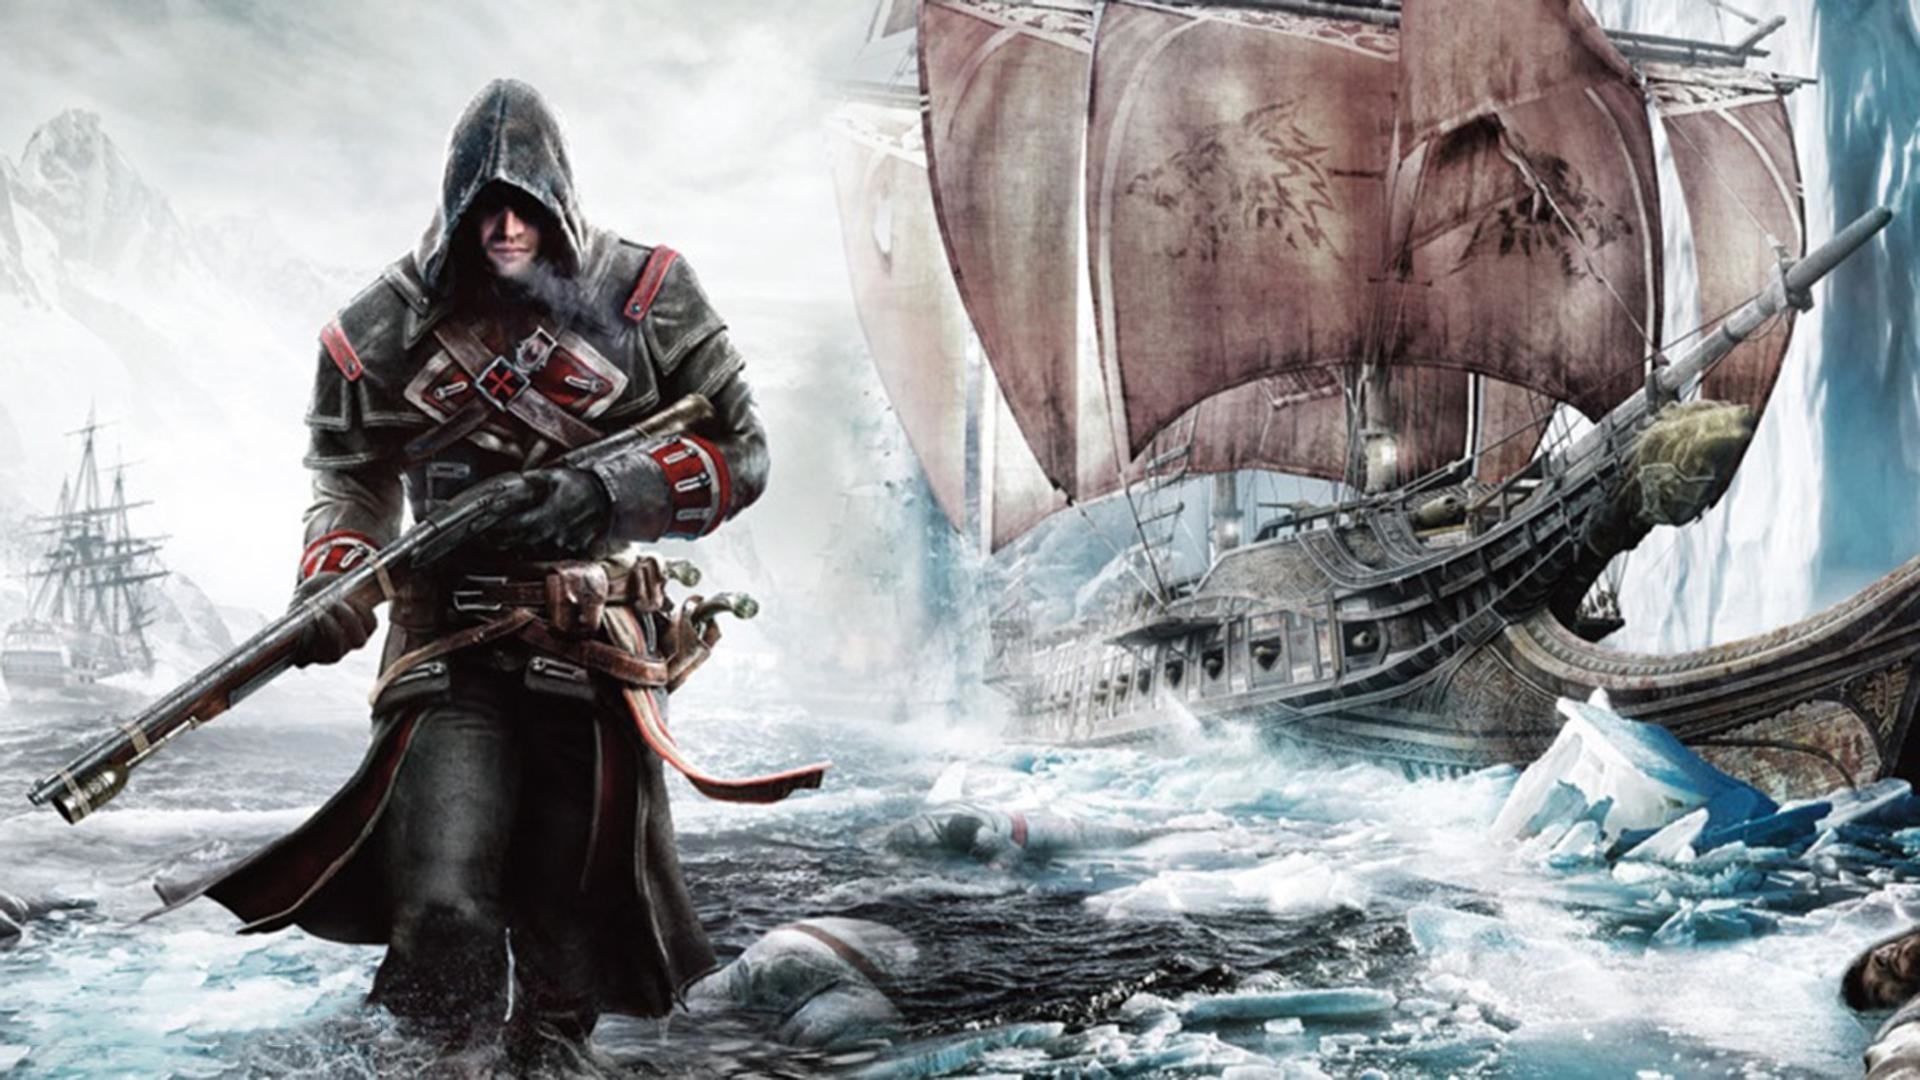 Click to edit; Assassin's Creed Rogue